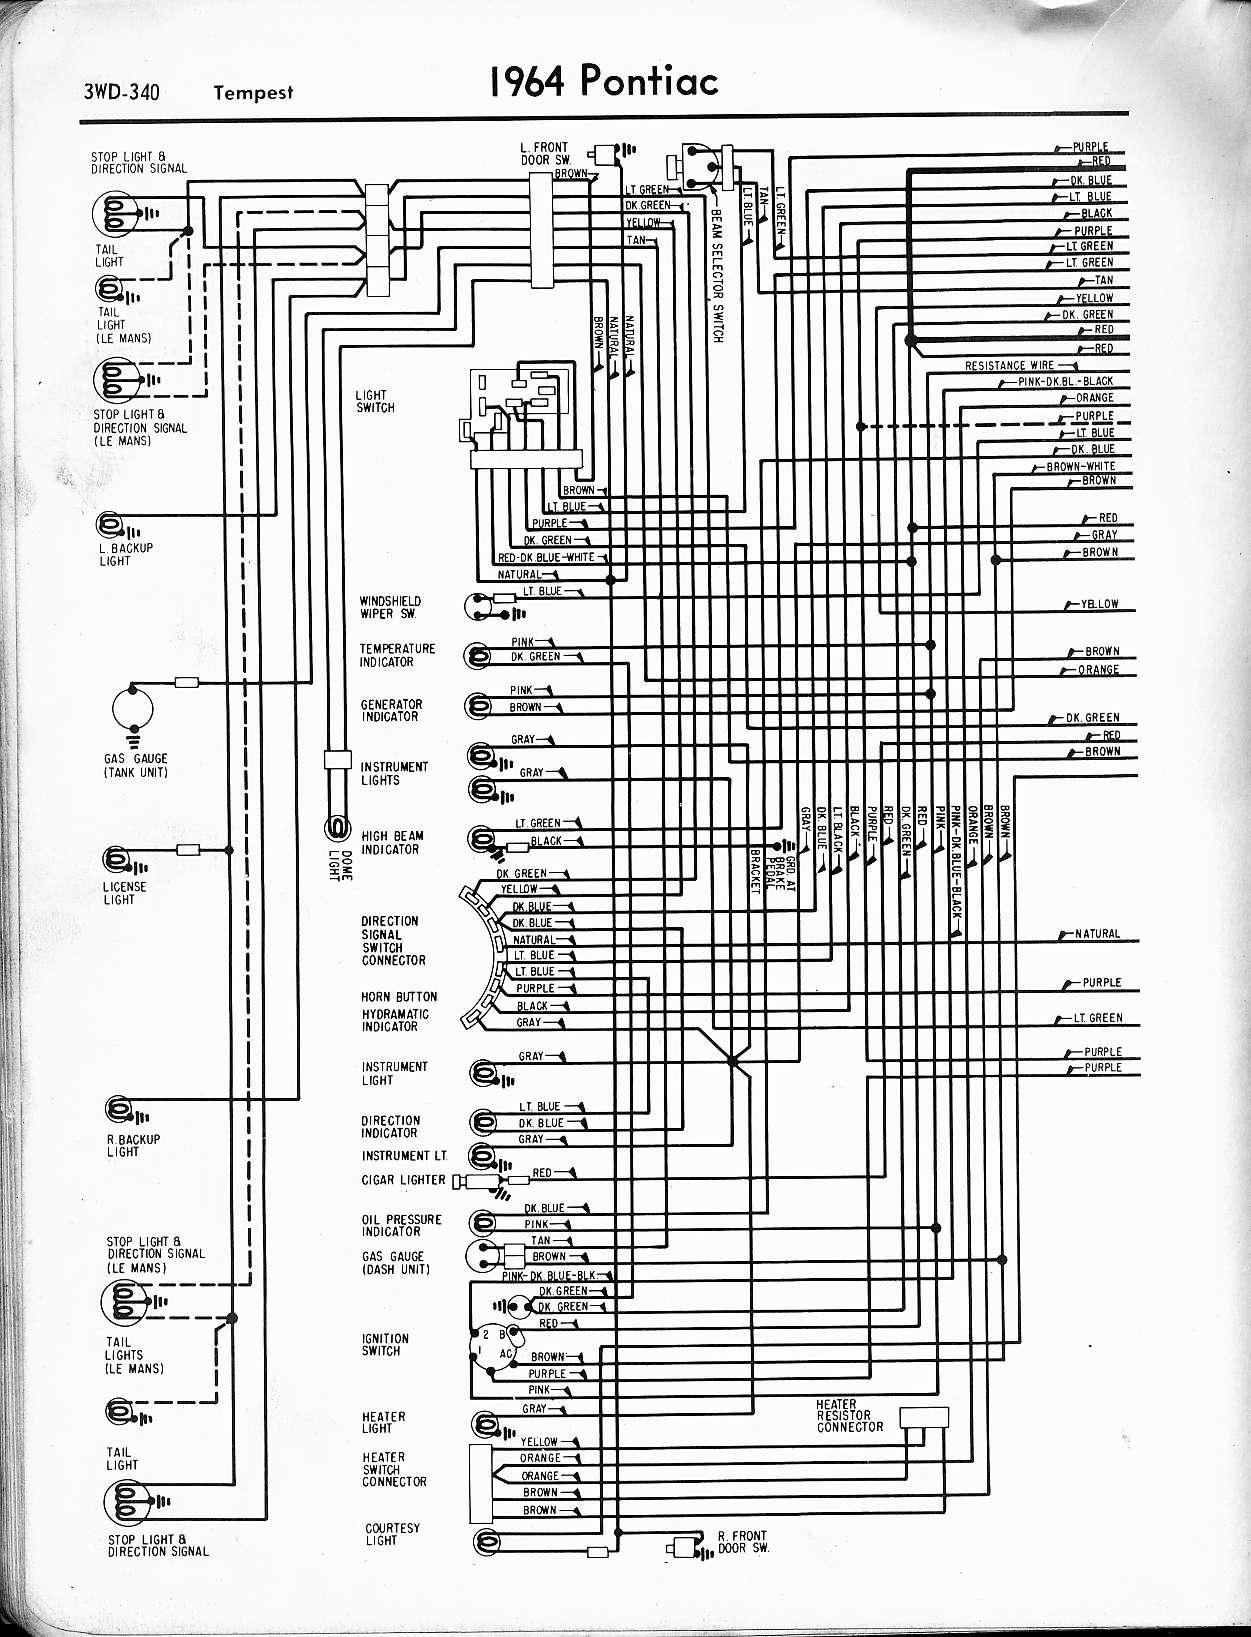 Astonishing 1965 4 Wire Alternator Diagram Wiring Diagram Wiring Cloud Eachirenstrafr09Org